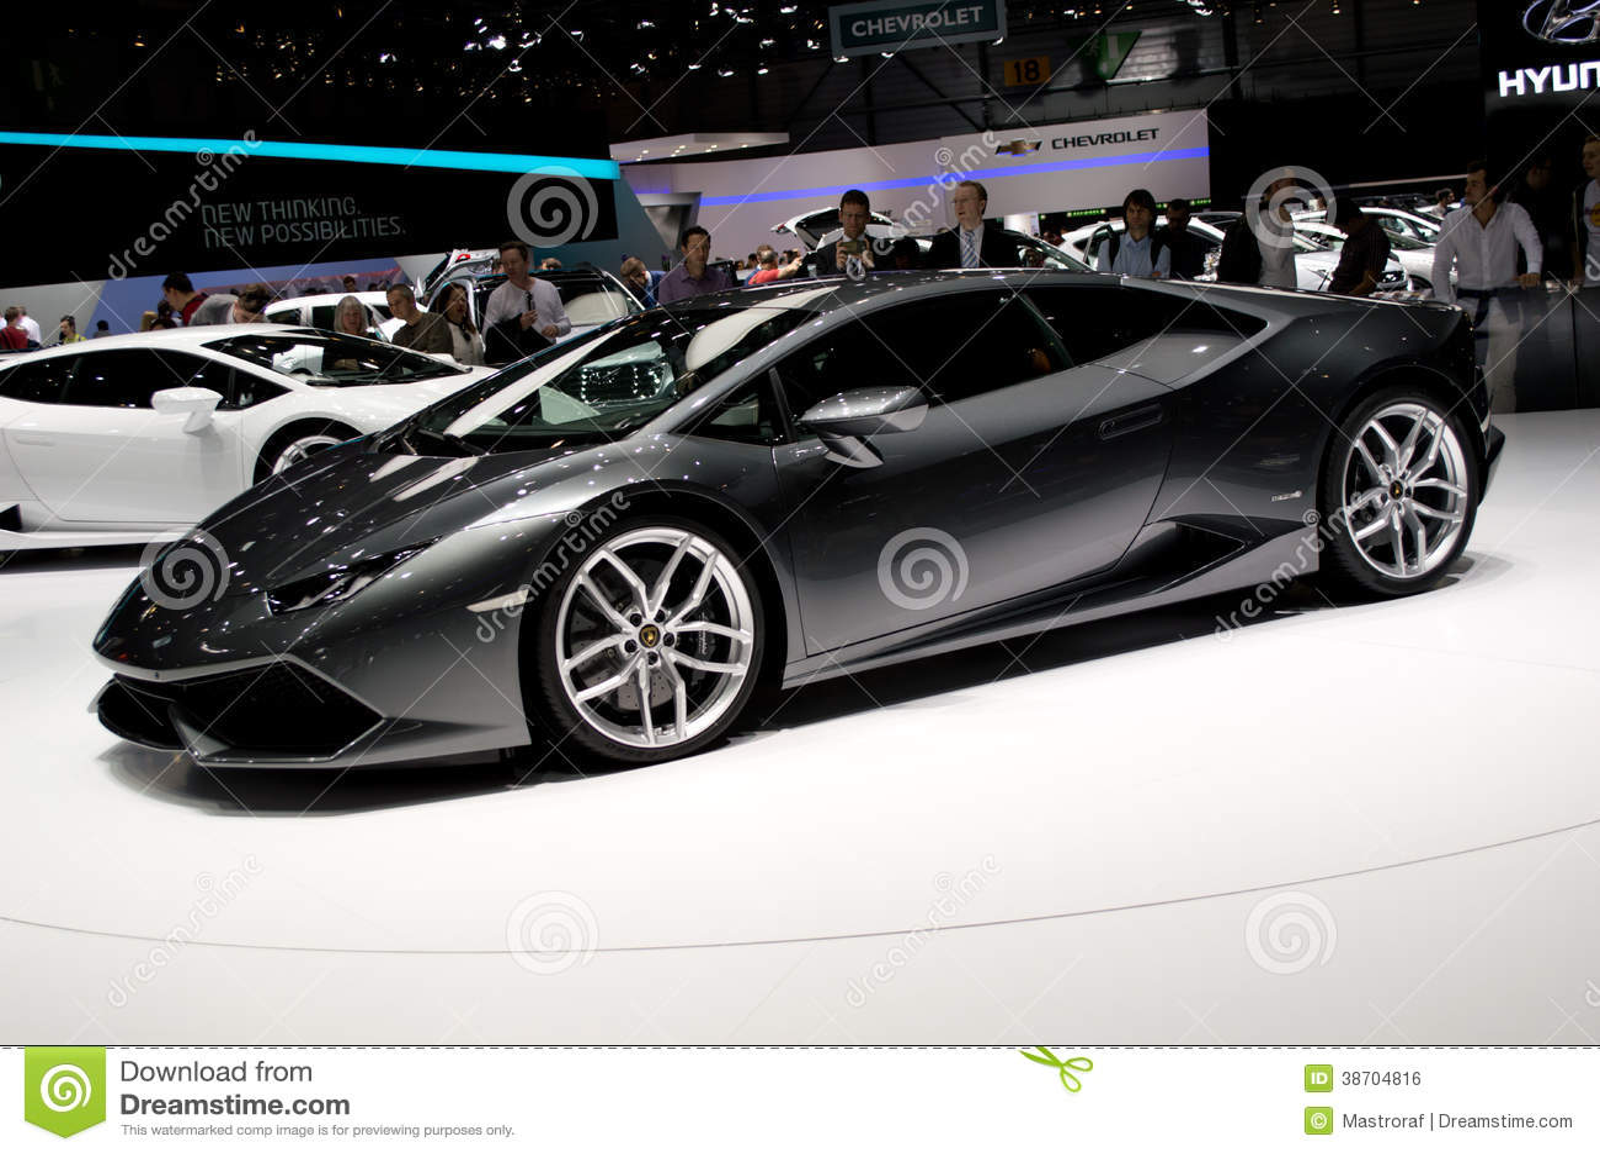 Lamborghini Huracan Genf 2014 Redaktionelles Foto Bild 38704816